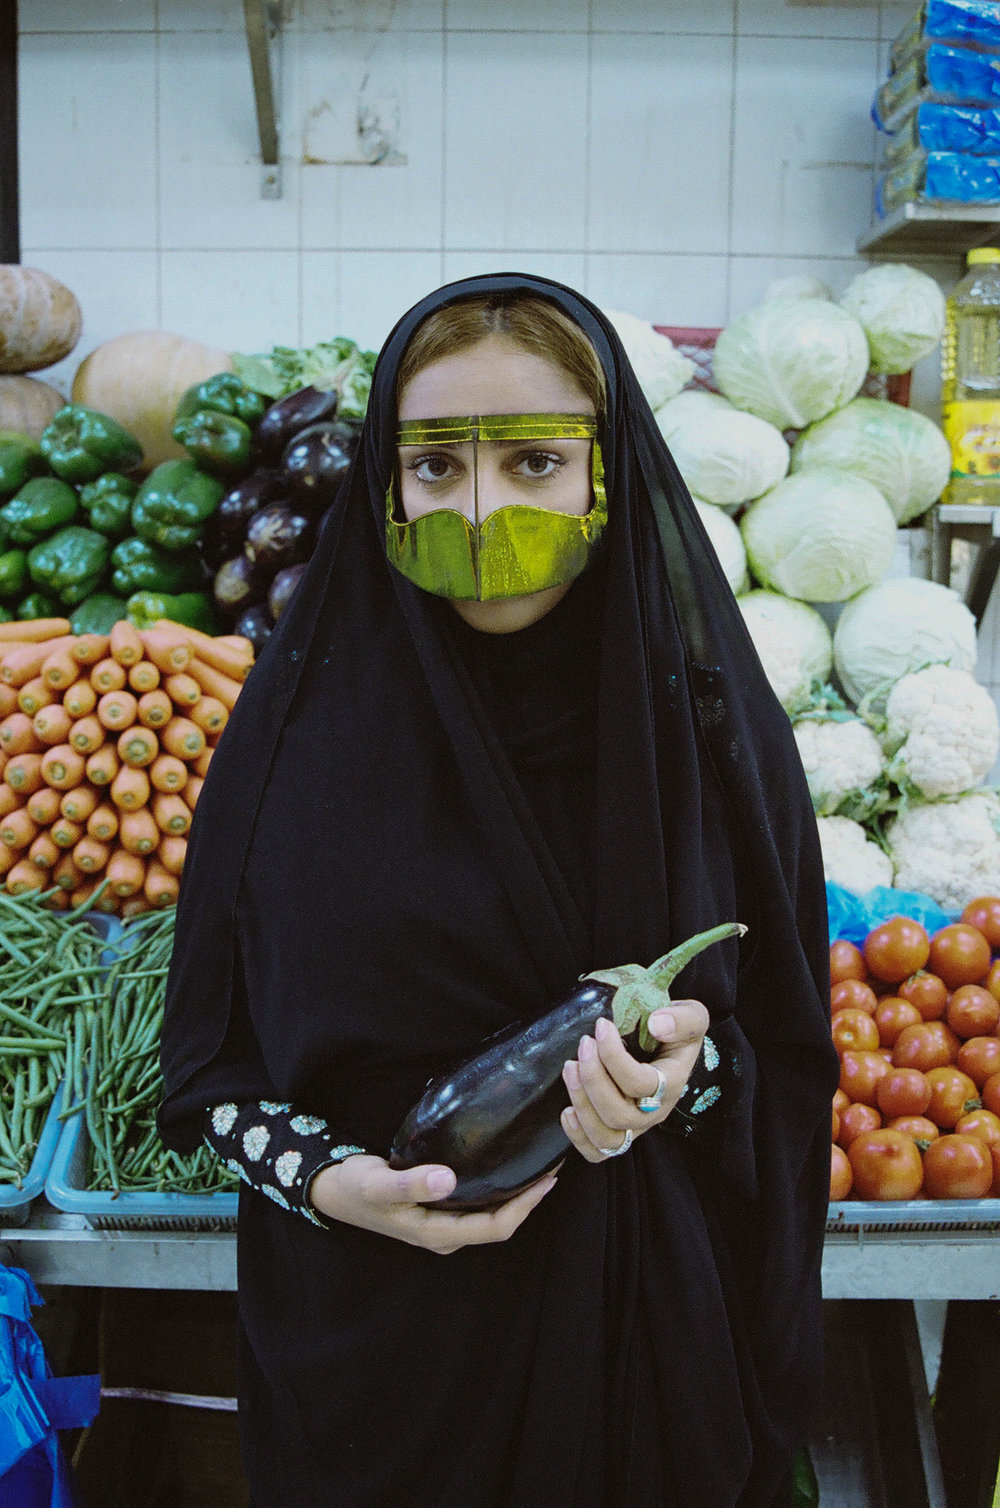 <b>Ali Al Shehabi</b></br><i>Freej Sisterhood</i> series</br>Photograph</br>16.5 x 11.7 in (A3)</br>$400.00